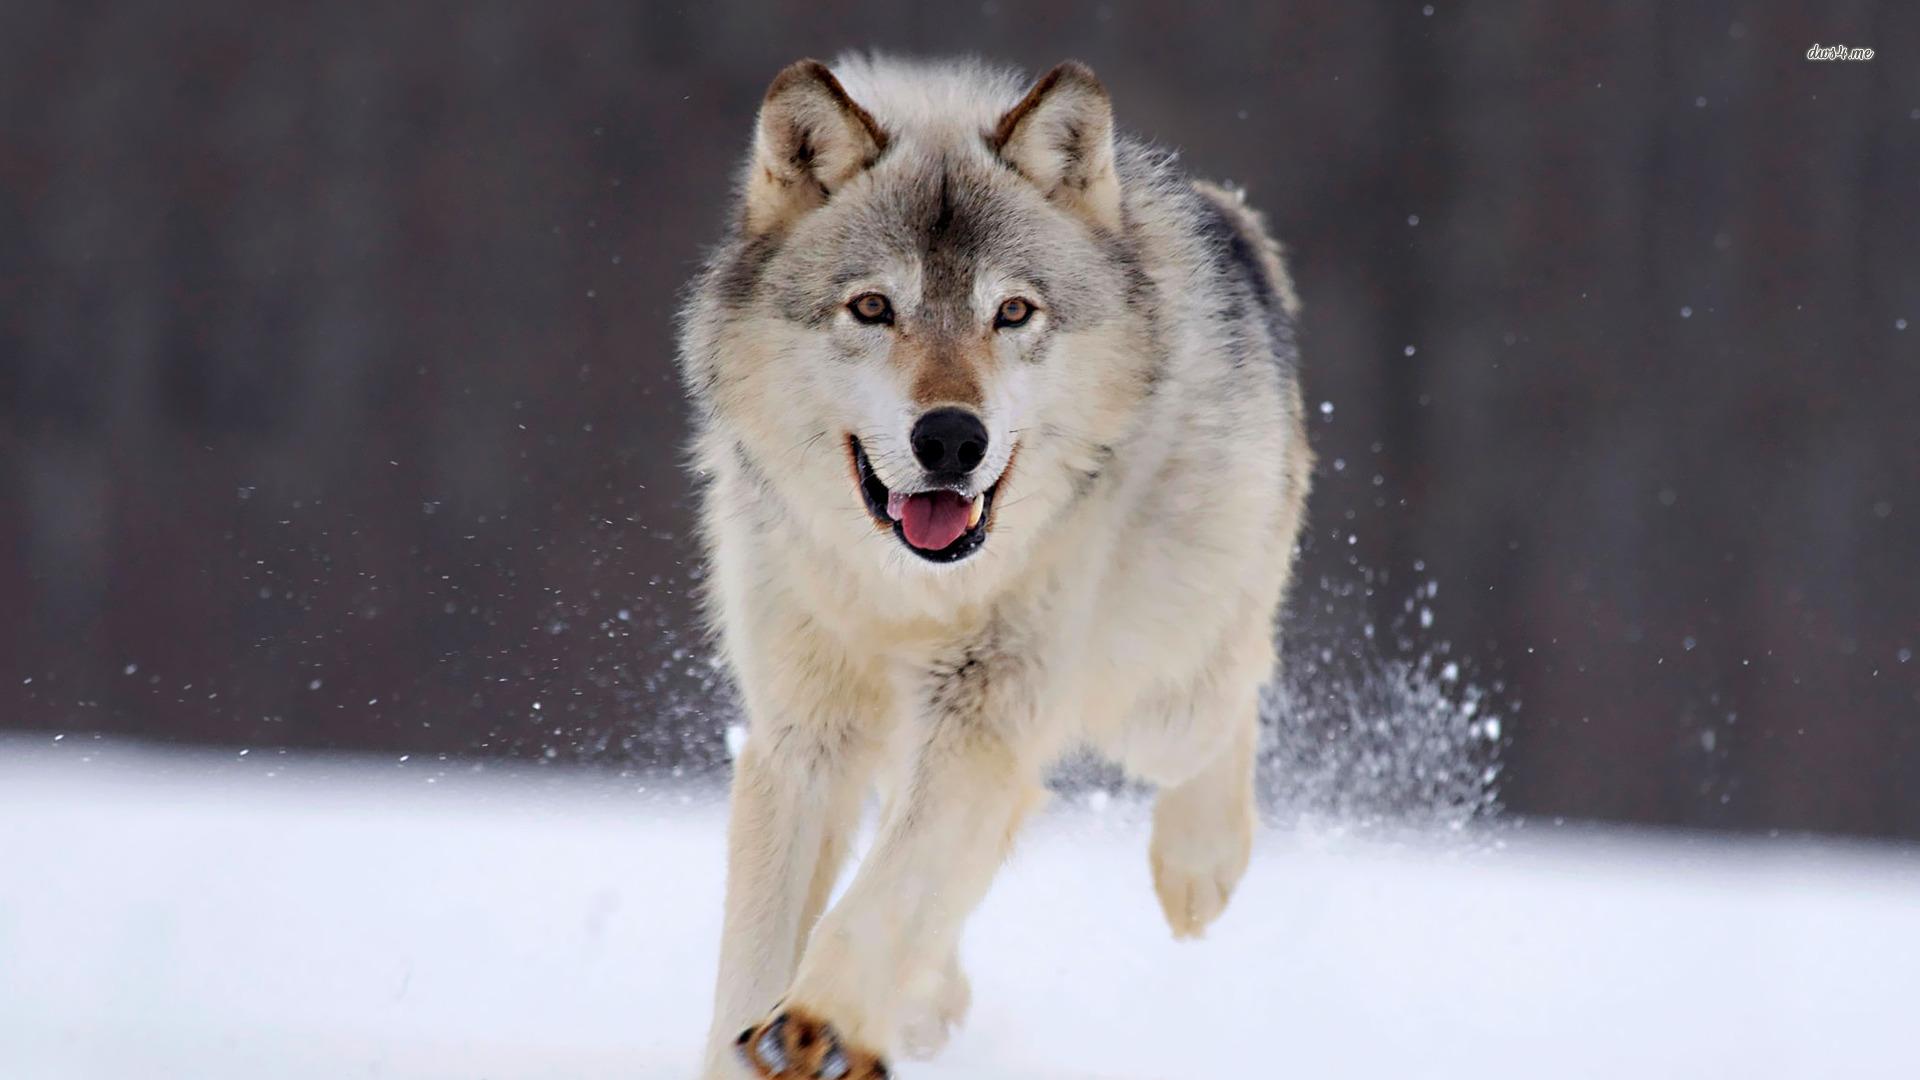 Wolf wallpaper   Animal wallpapers   3651 1920x1080